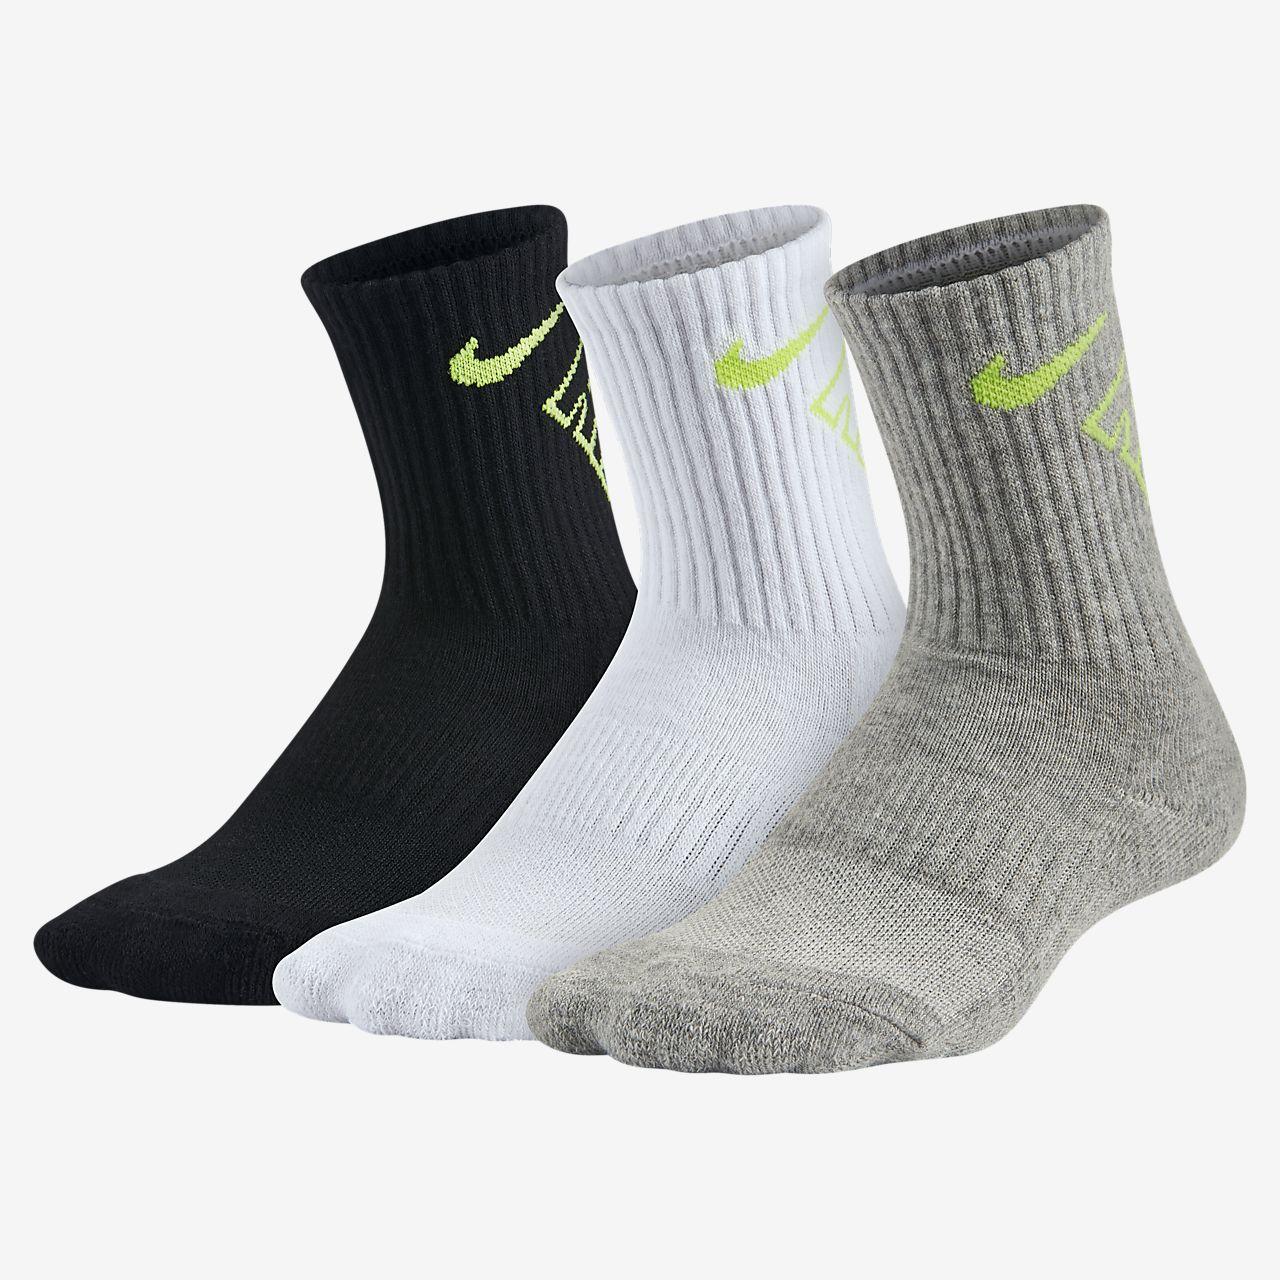 Nike Swoosh Crew Little Kids' Socks (3 Pair)